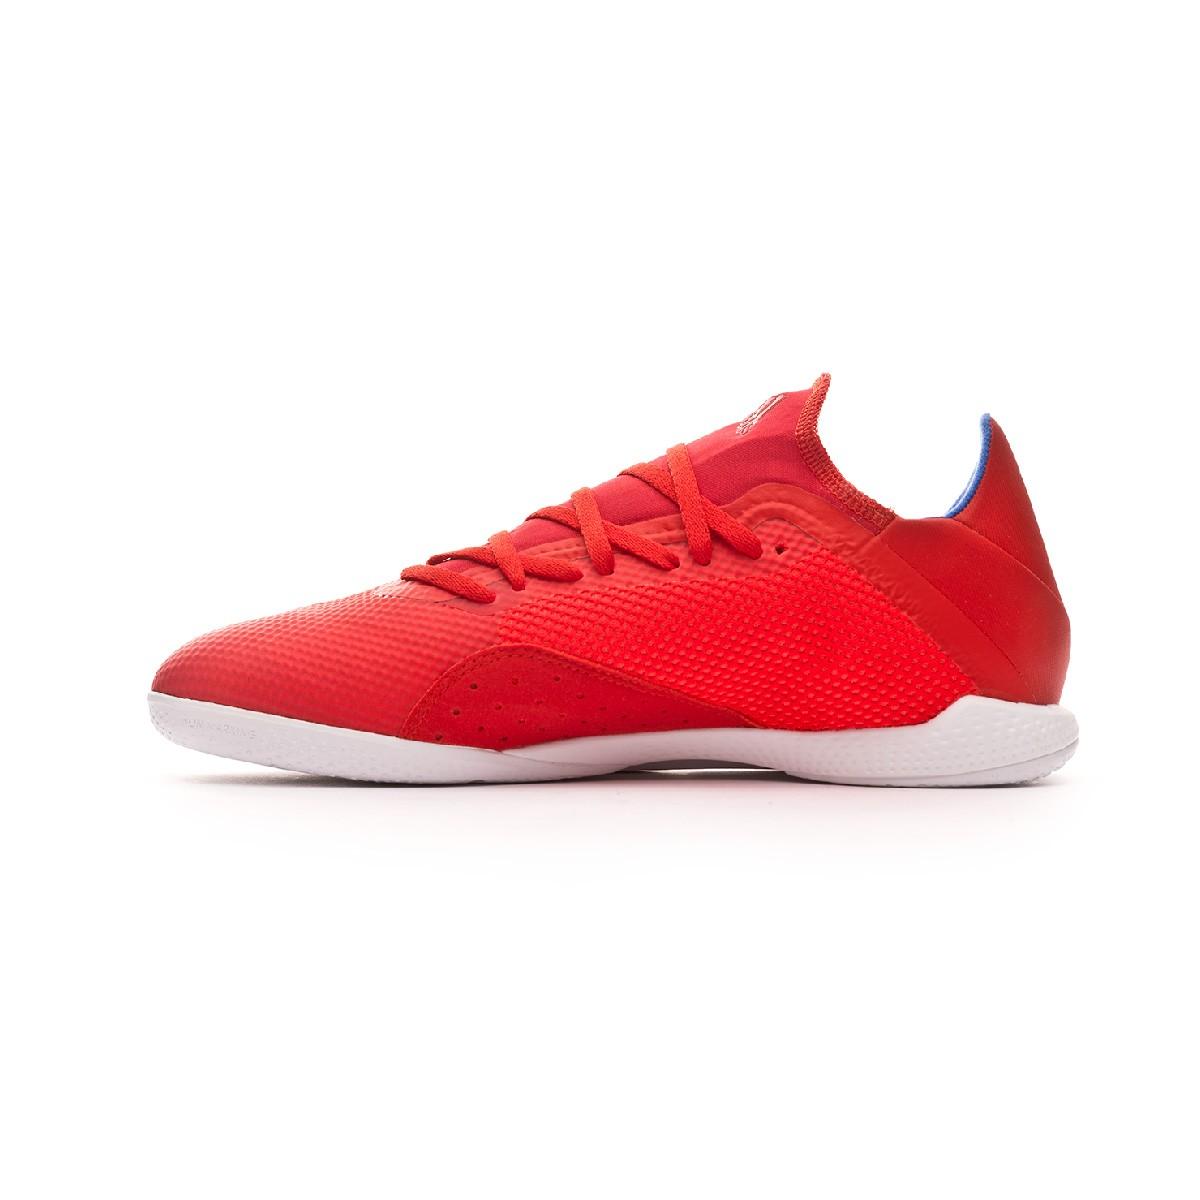 d360ddb0cddcc Sapatilha de Futsal adidas X Tango 18.3 IN Active red-Silver metallic-Bold  blue - Loja de futebol Fútbol Emotion